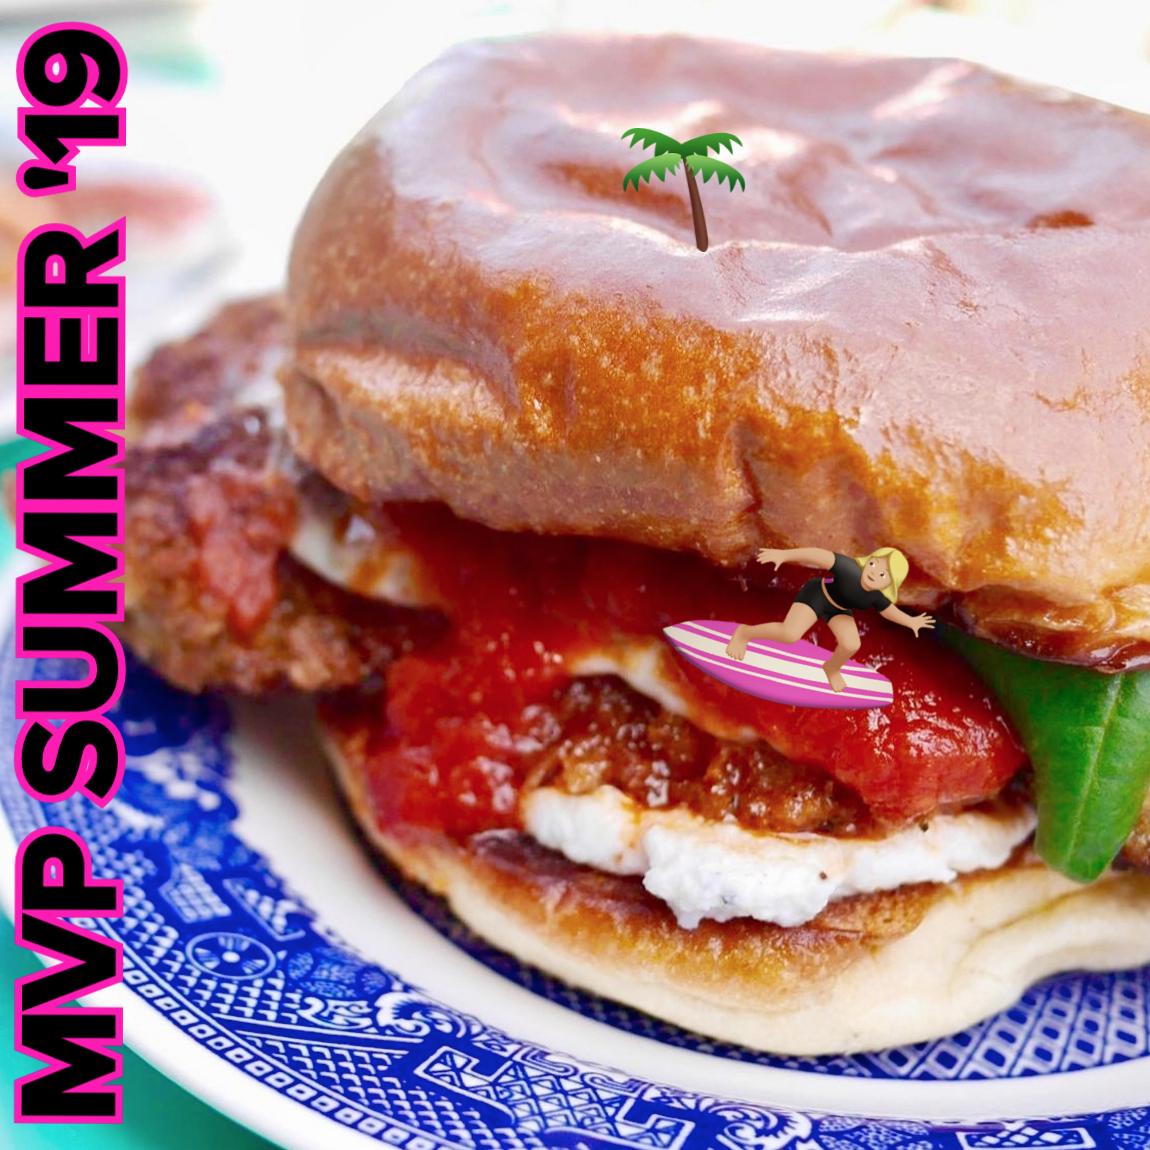 matt's veal parm summer playlist 2019